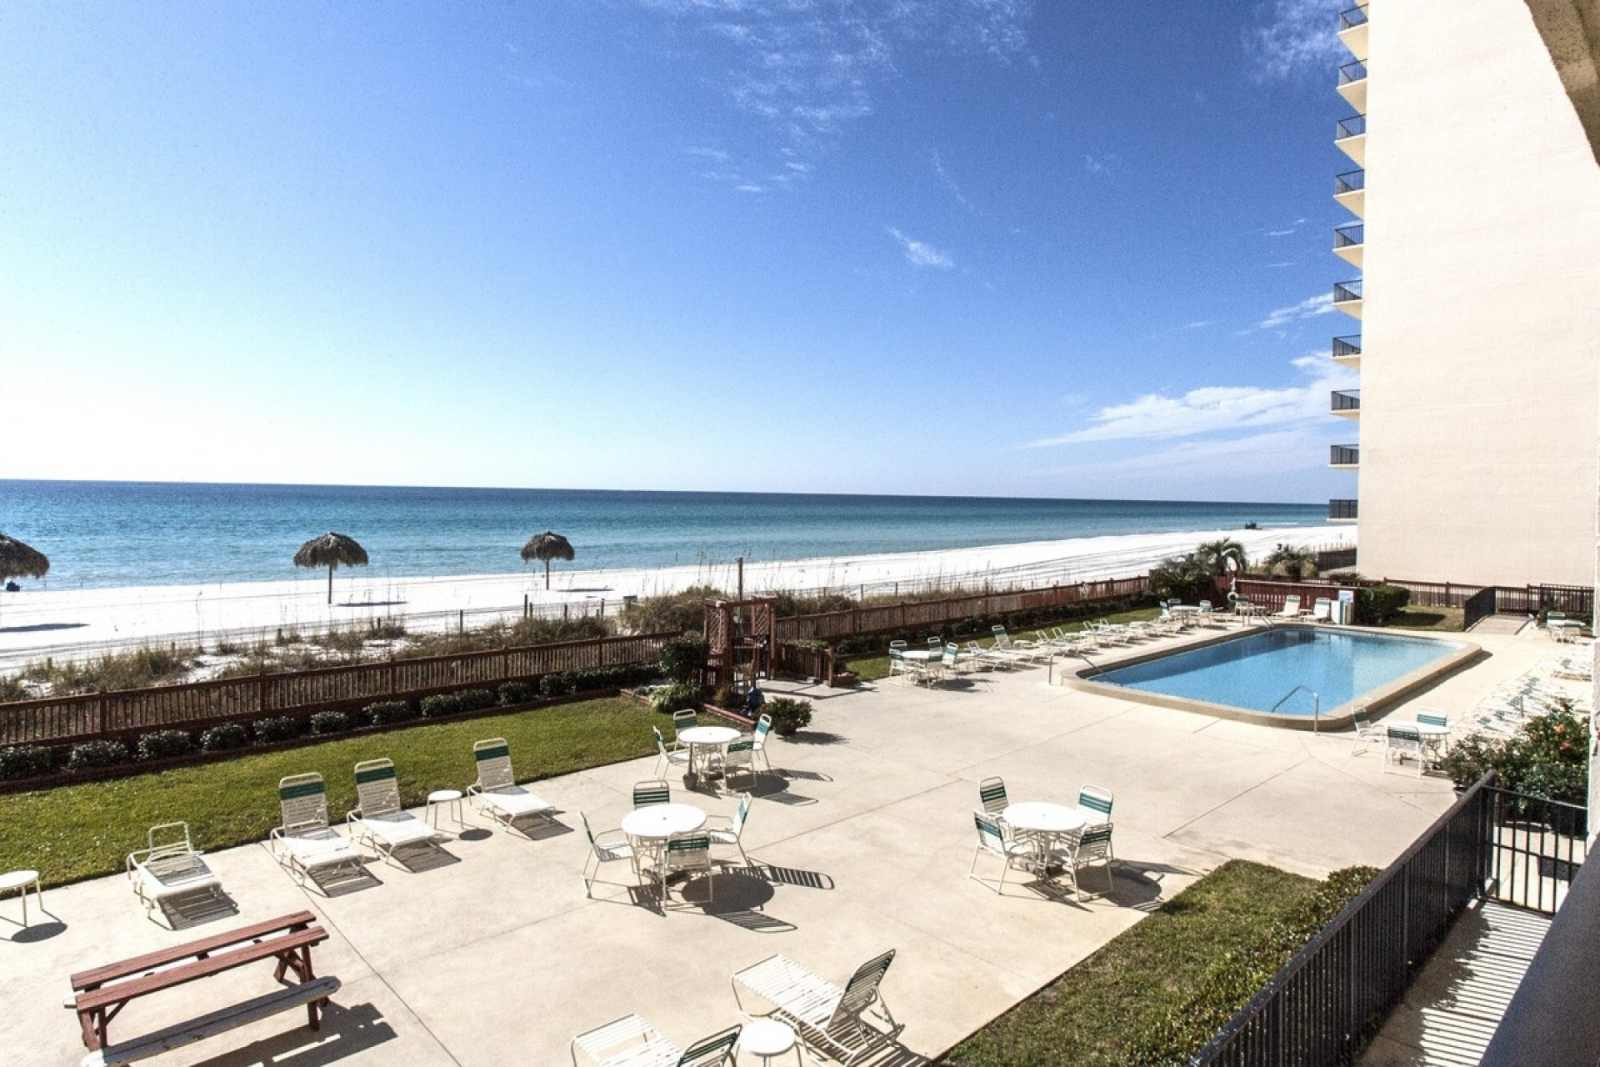 Panama City Beach Vacation Al 209 Mariner West East End Condo On Itrip